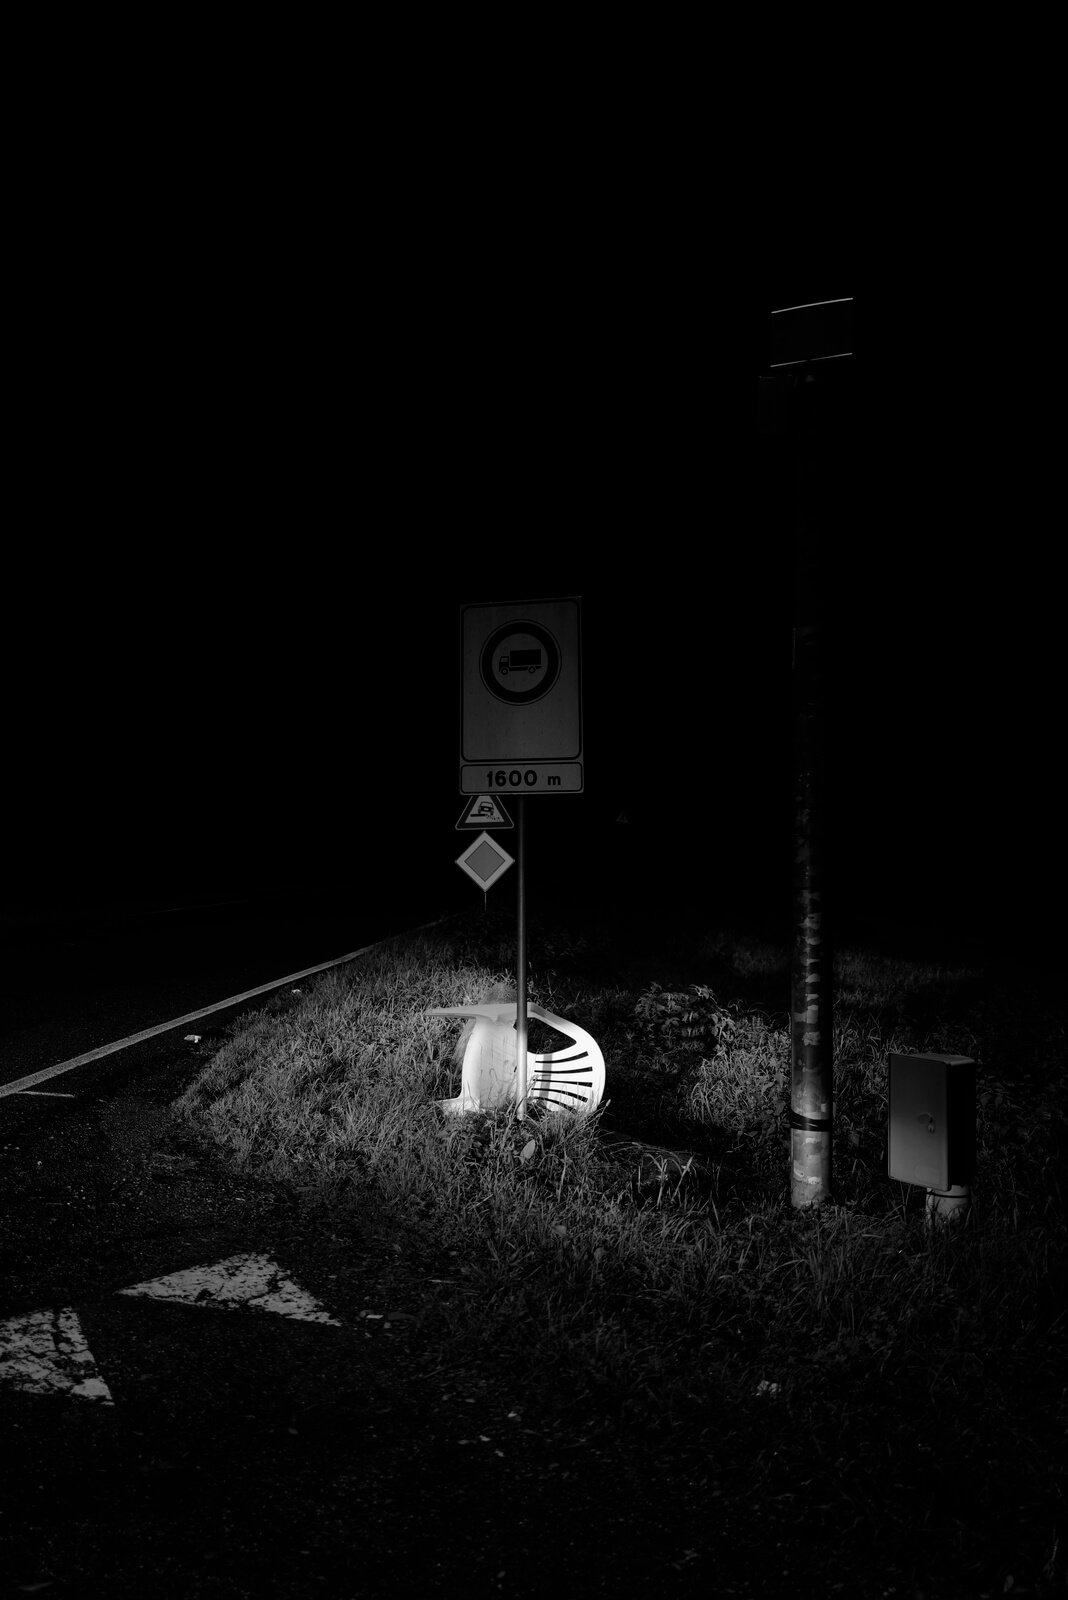 3_The-Absence_Attilio-Solzi